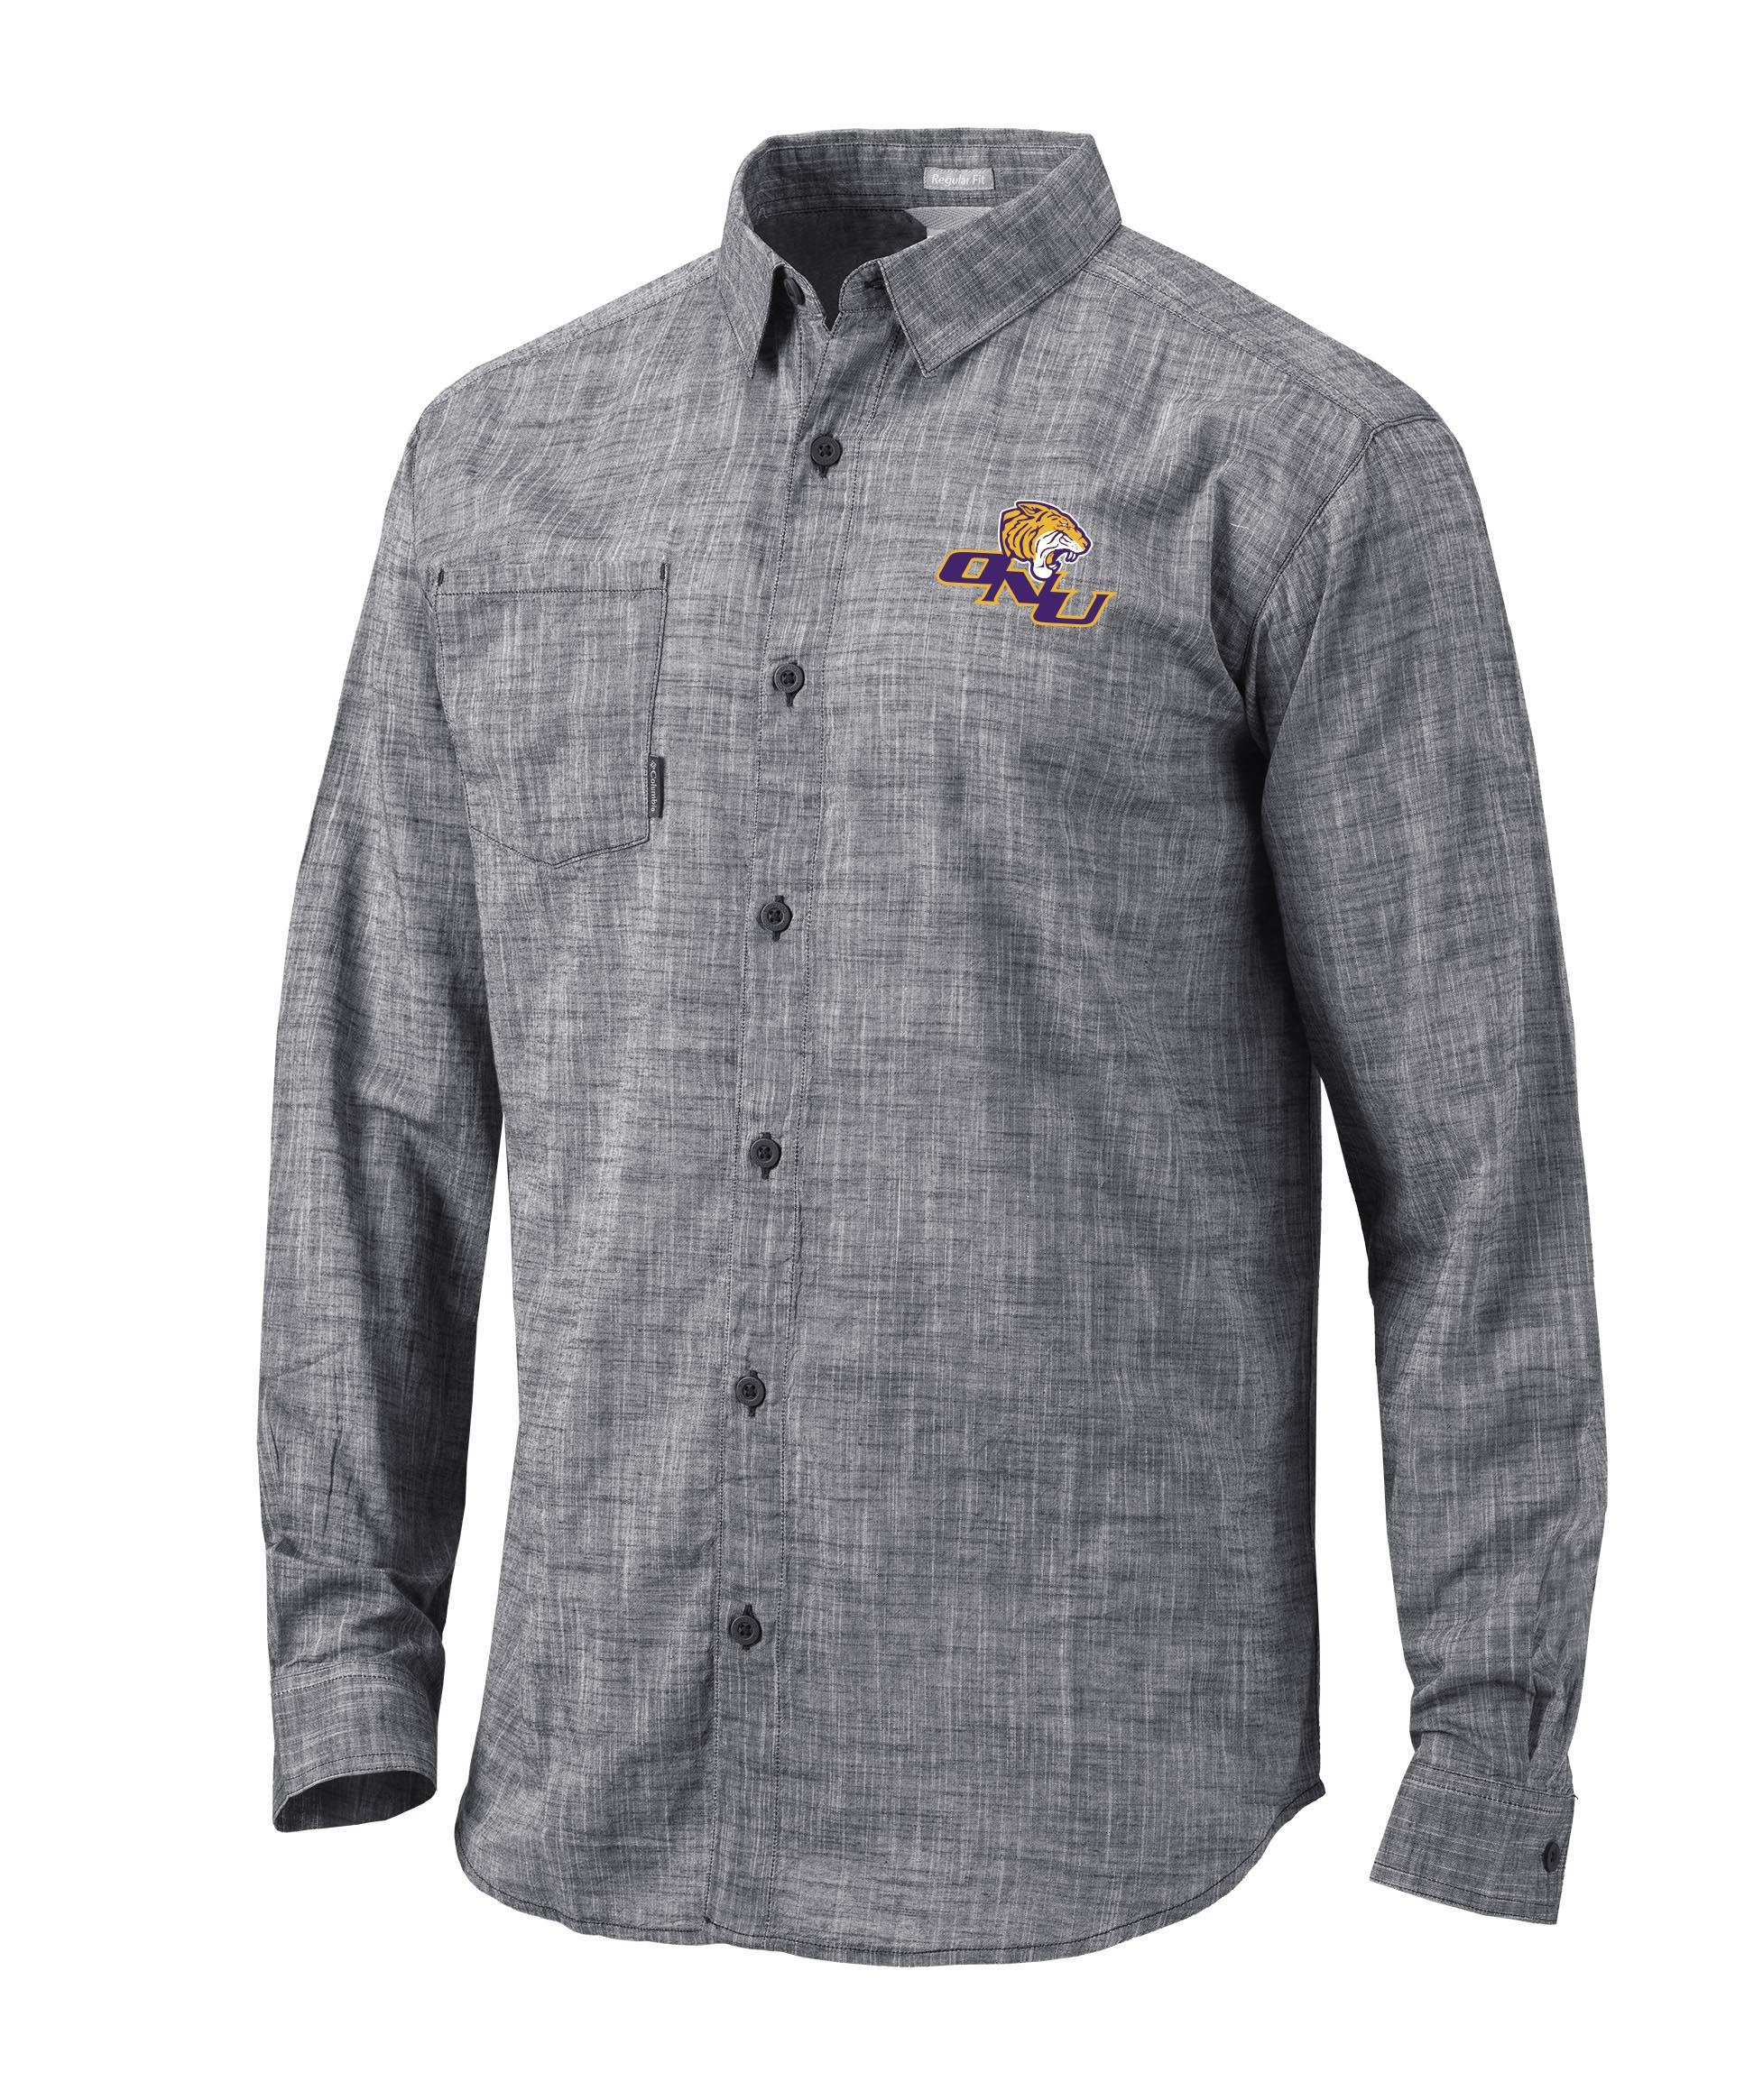 image of: Under Exposure Long Sleeve Shirt